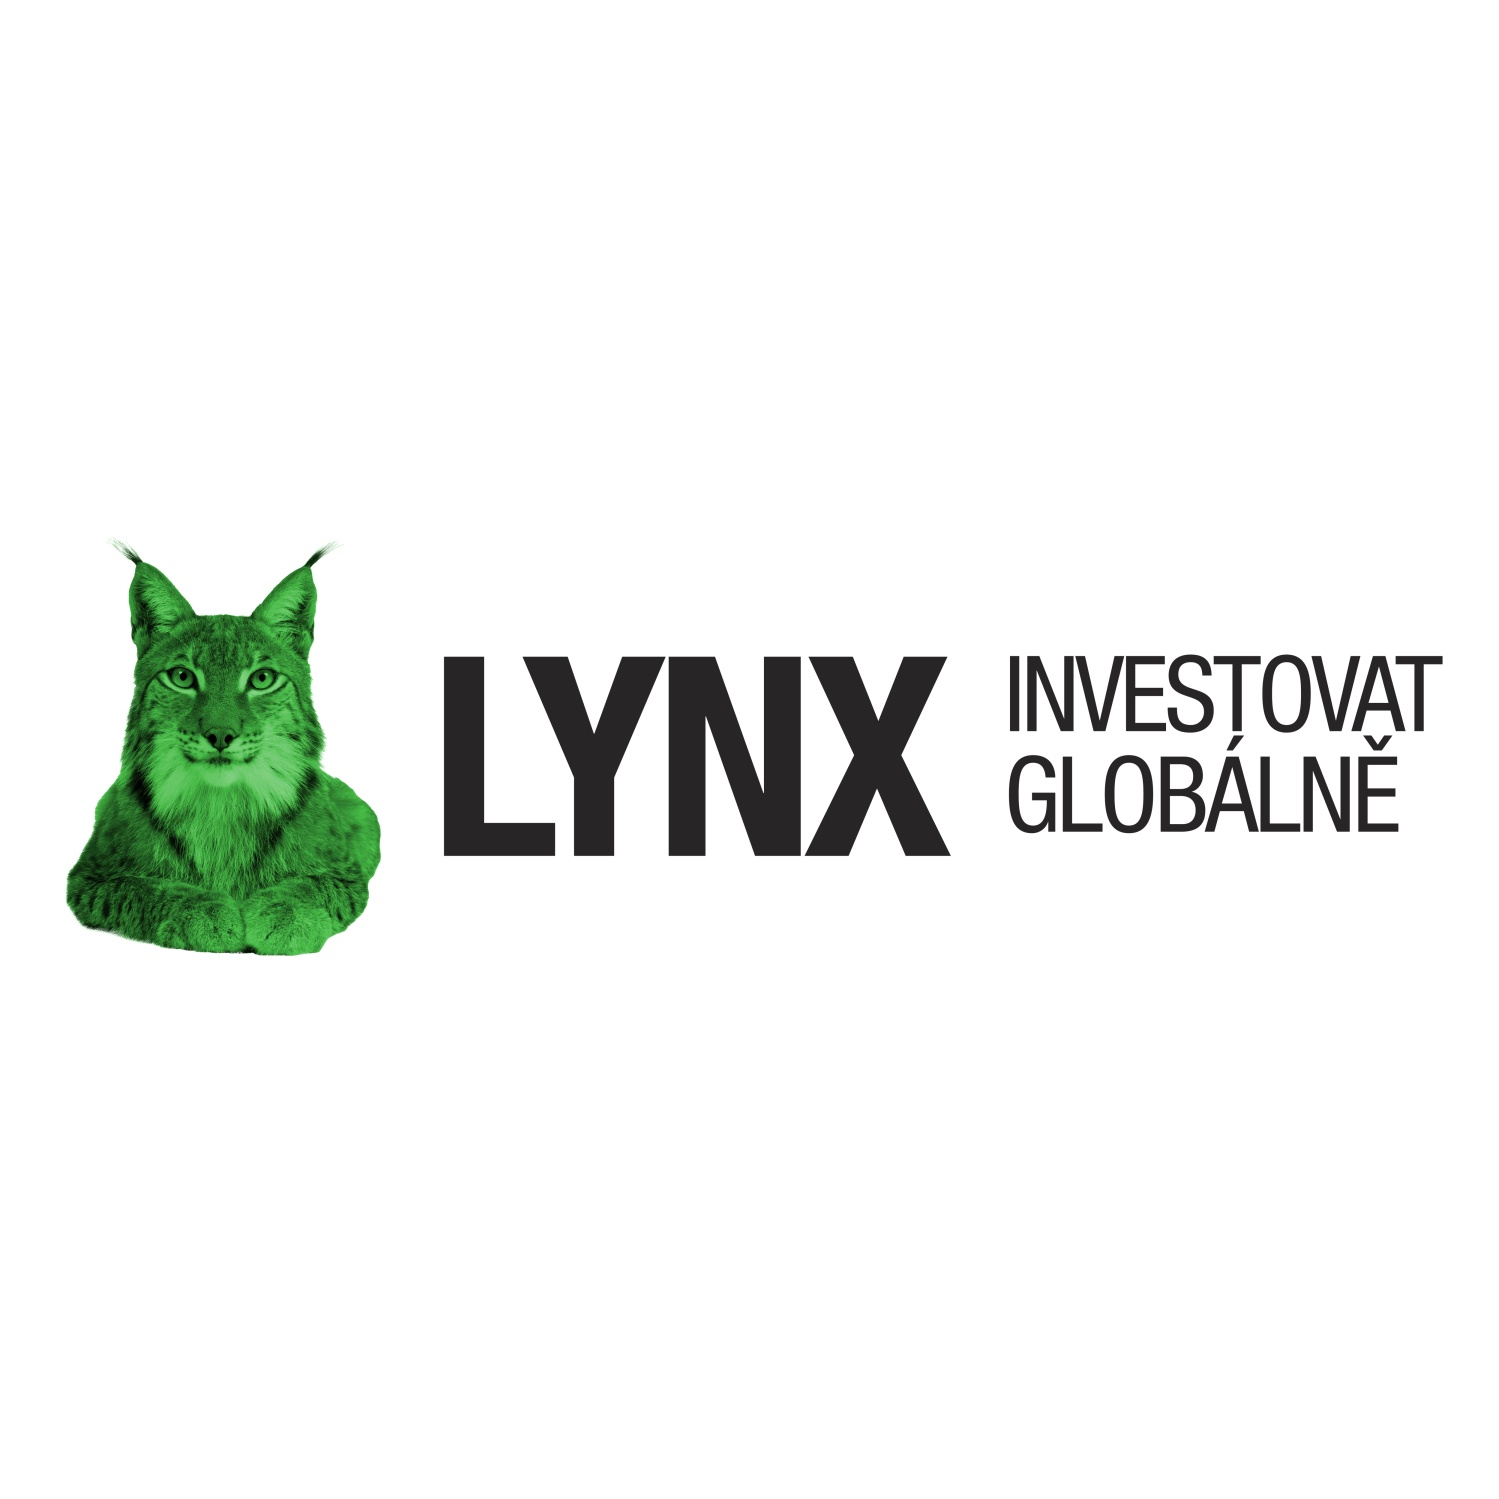 Lynx forex handel